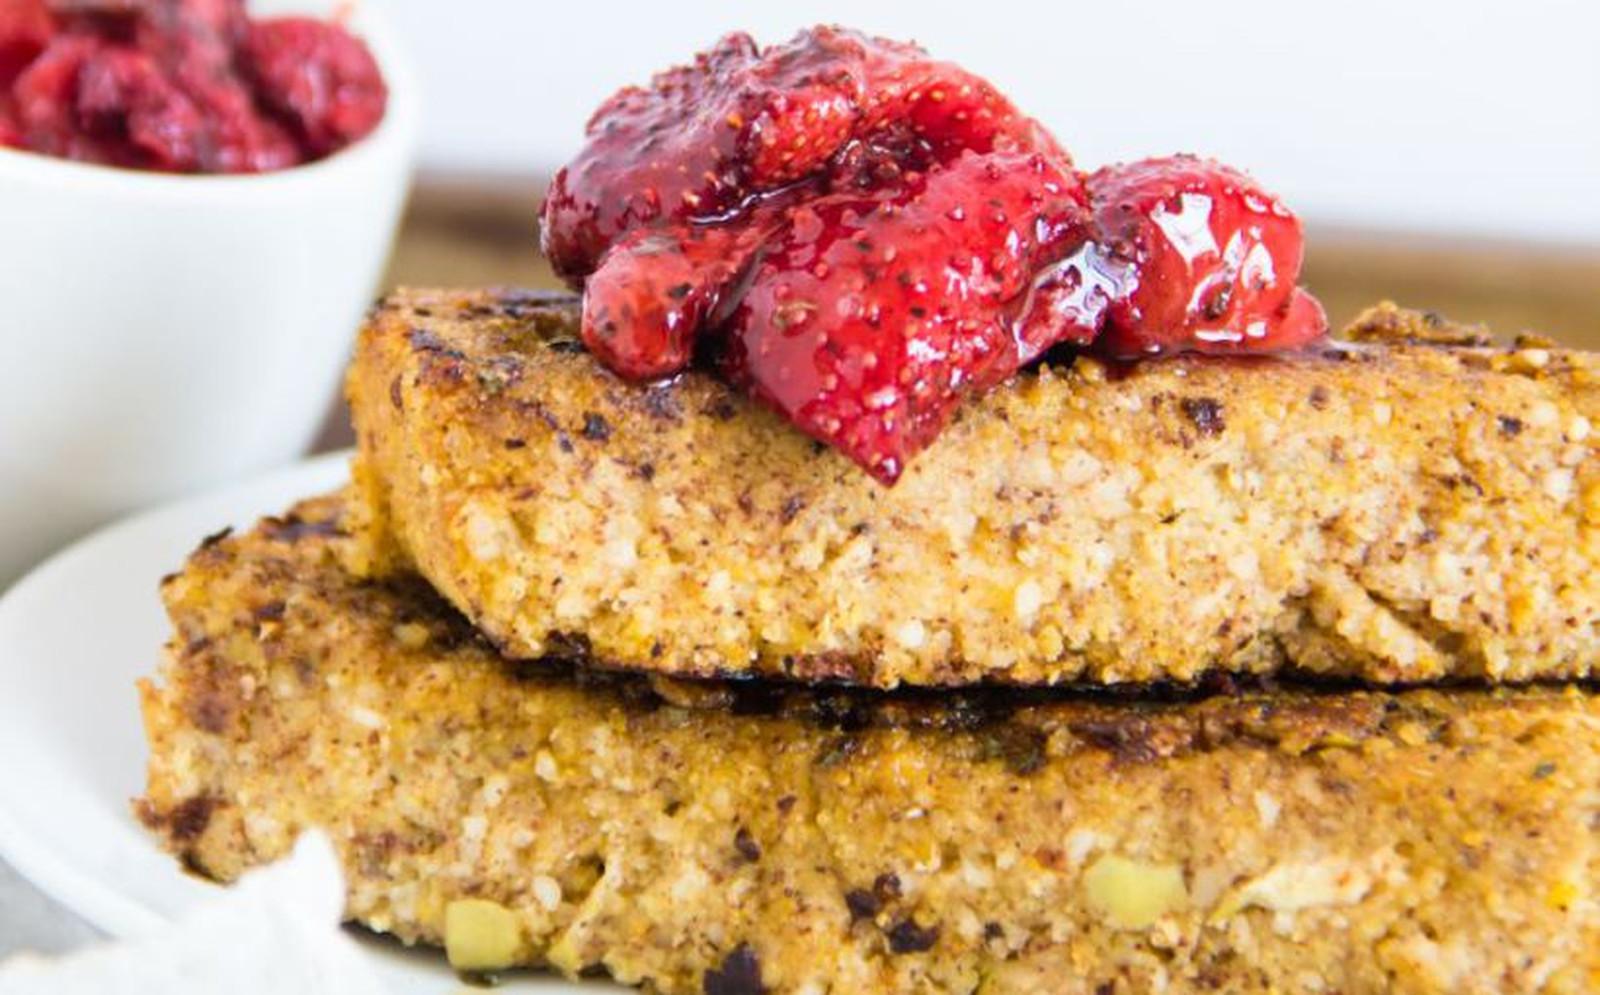 Apple Cornbread French Toast Cake With Roasted Strawberries [Vegan, Gluten-Free]